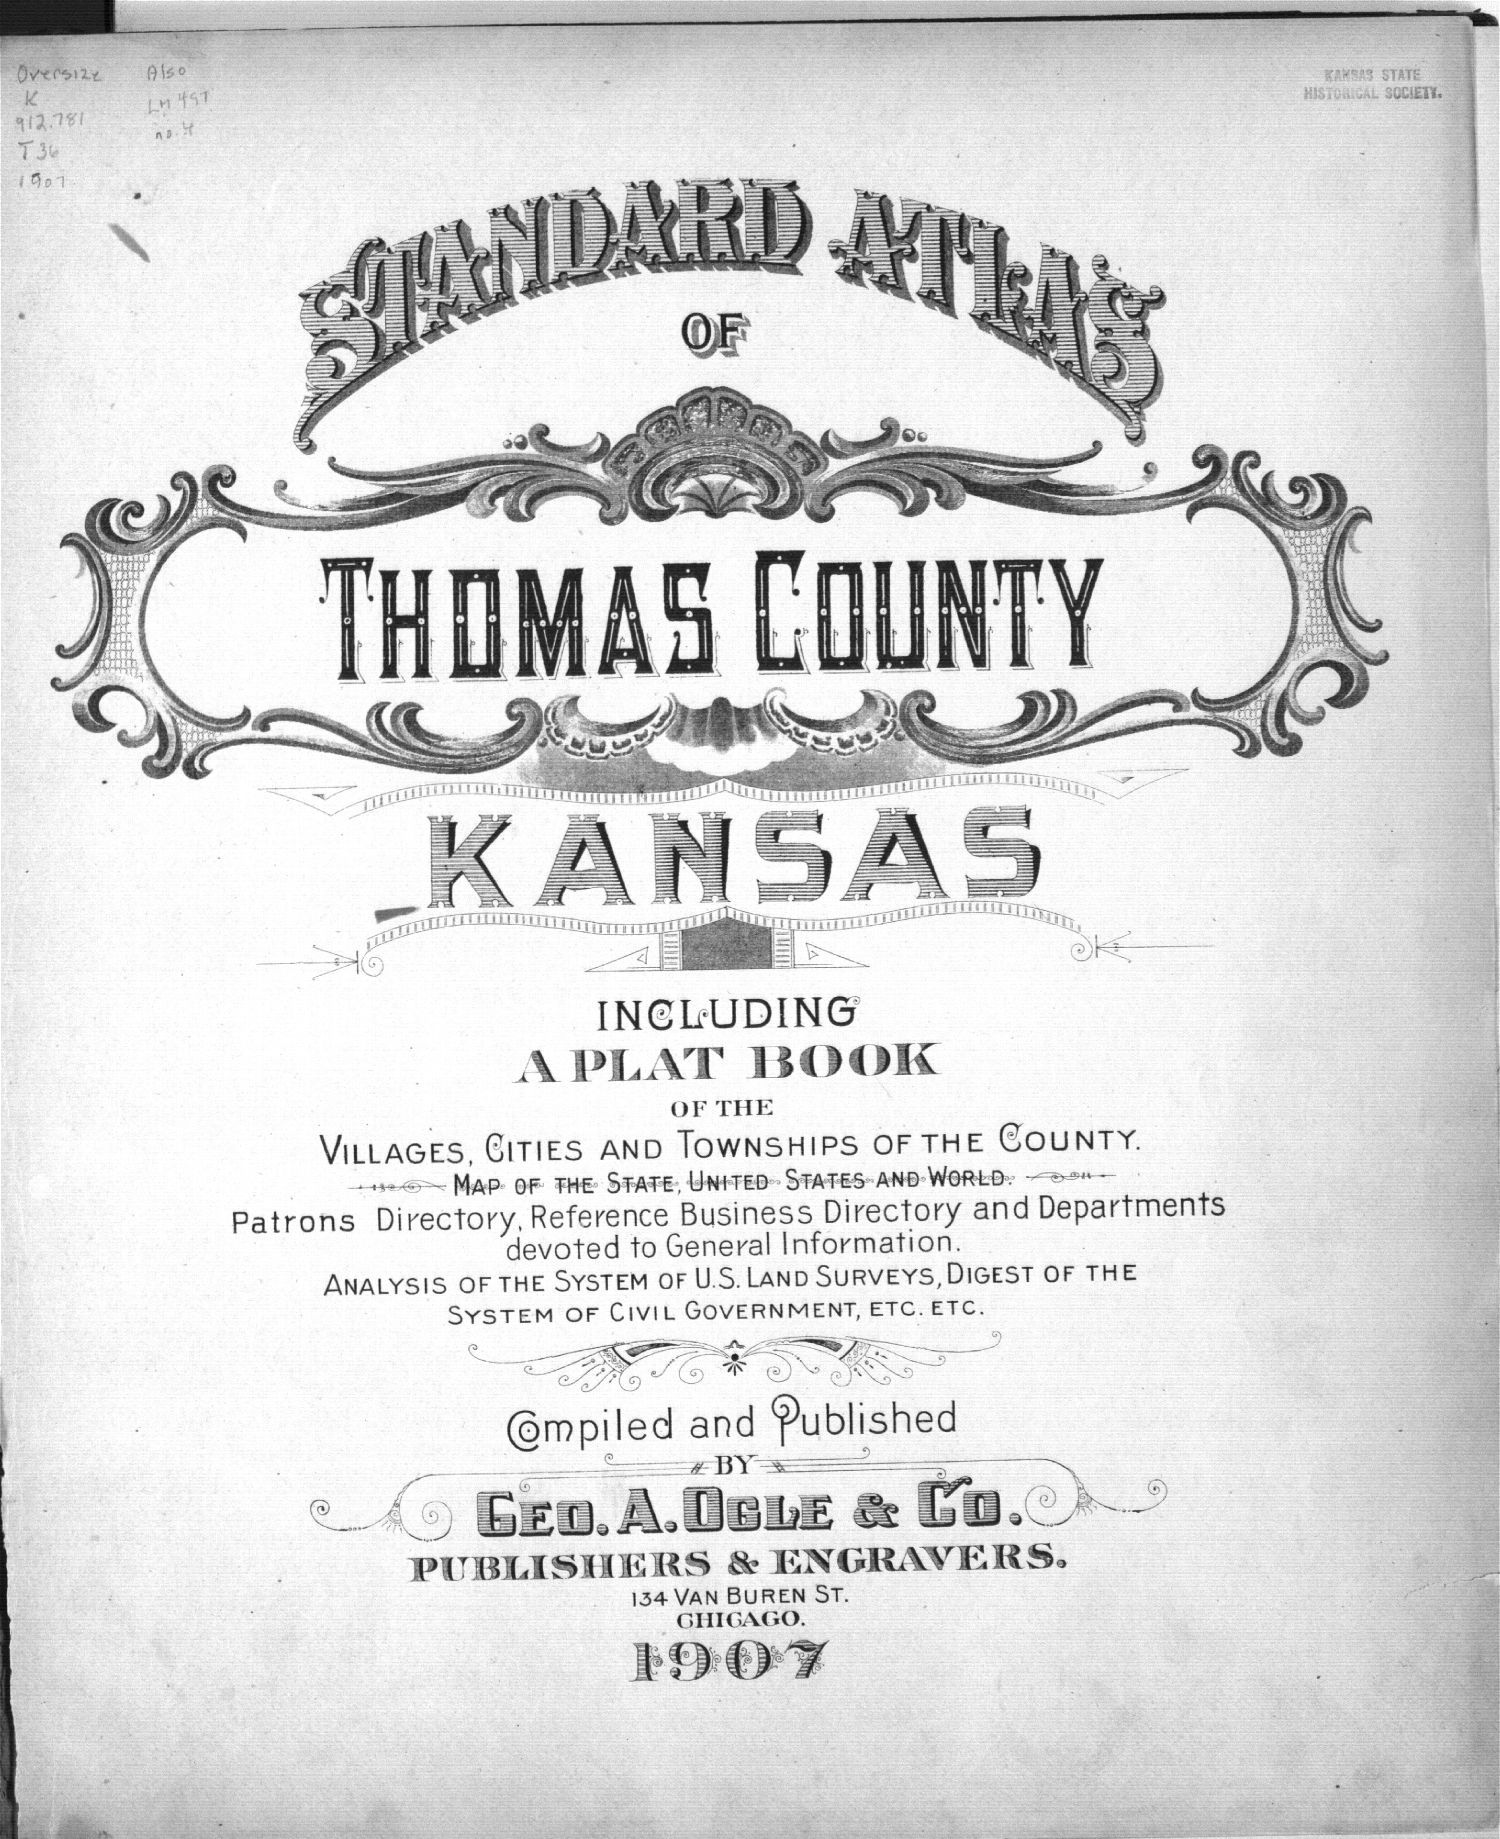 Standard atlas of Thomas County, Kansas - Title Page